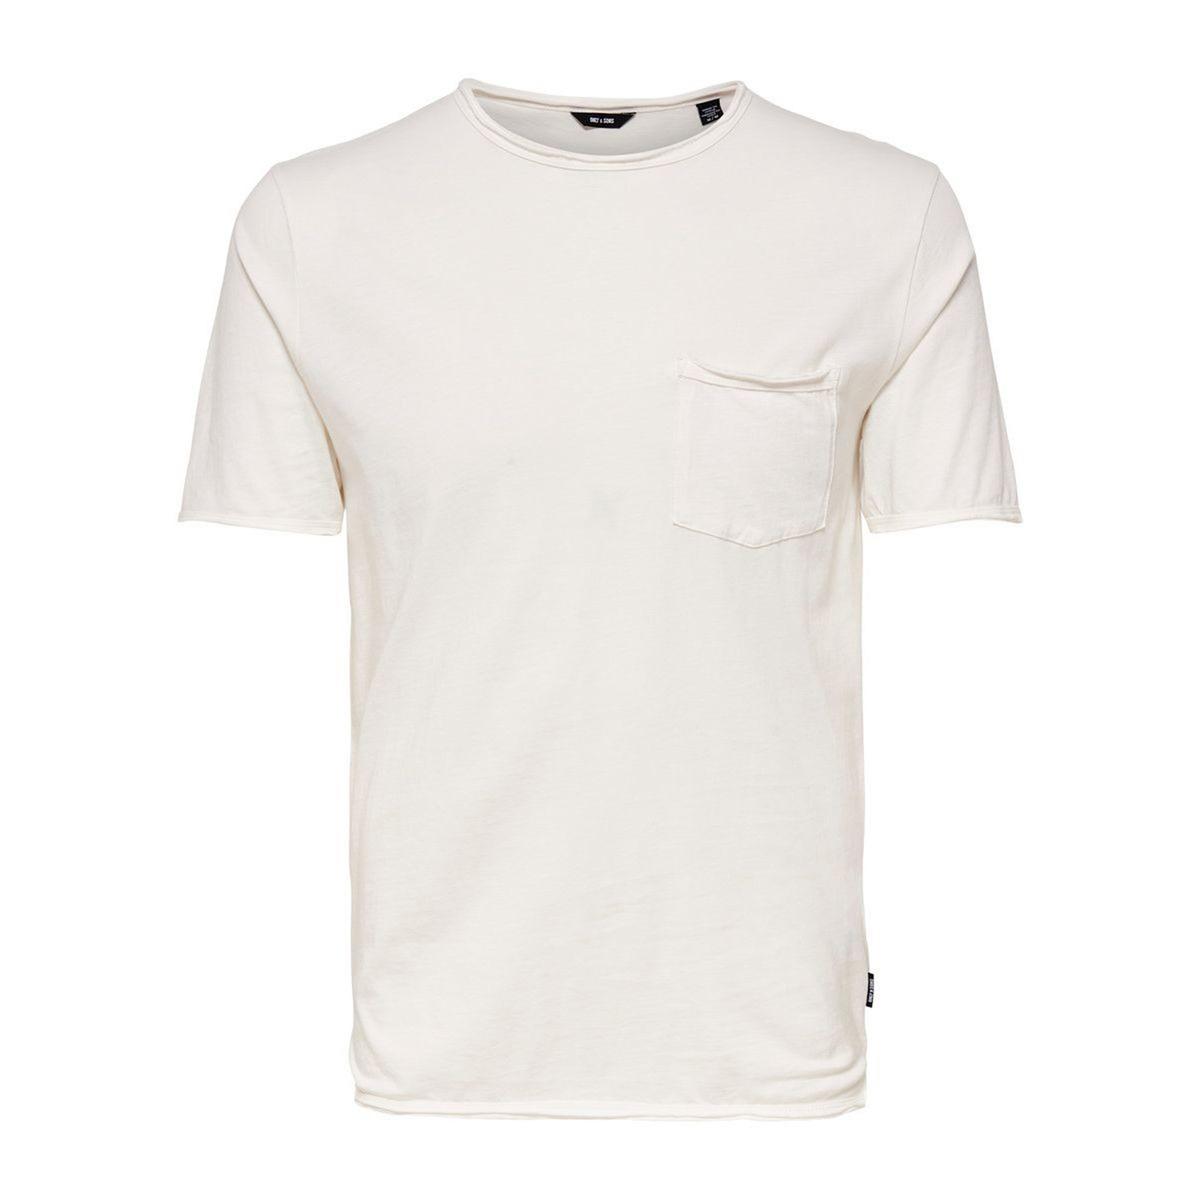 Футболка с круглым вырезом и короткими рукавами футболка quelle john devin 288247